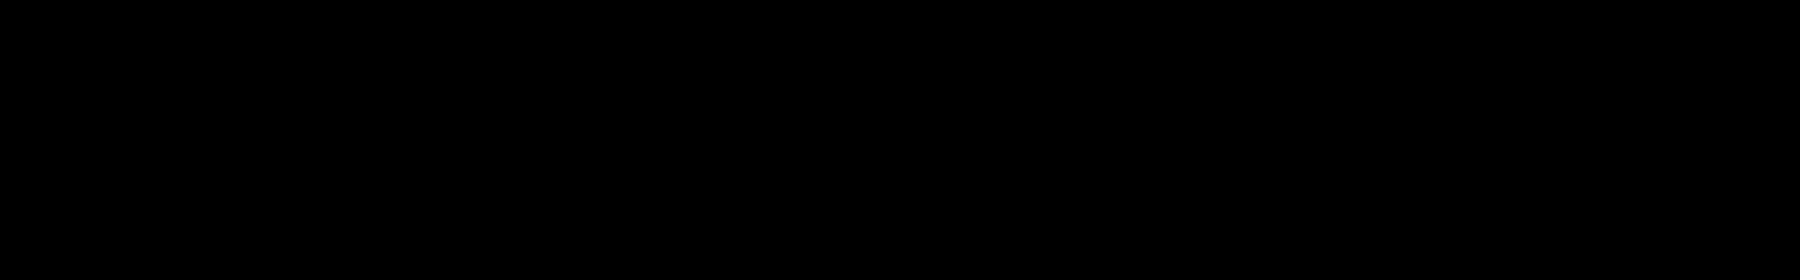 Spyro audio waveform